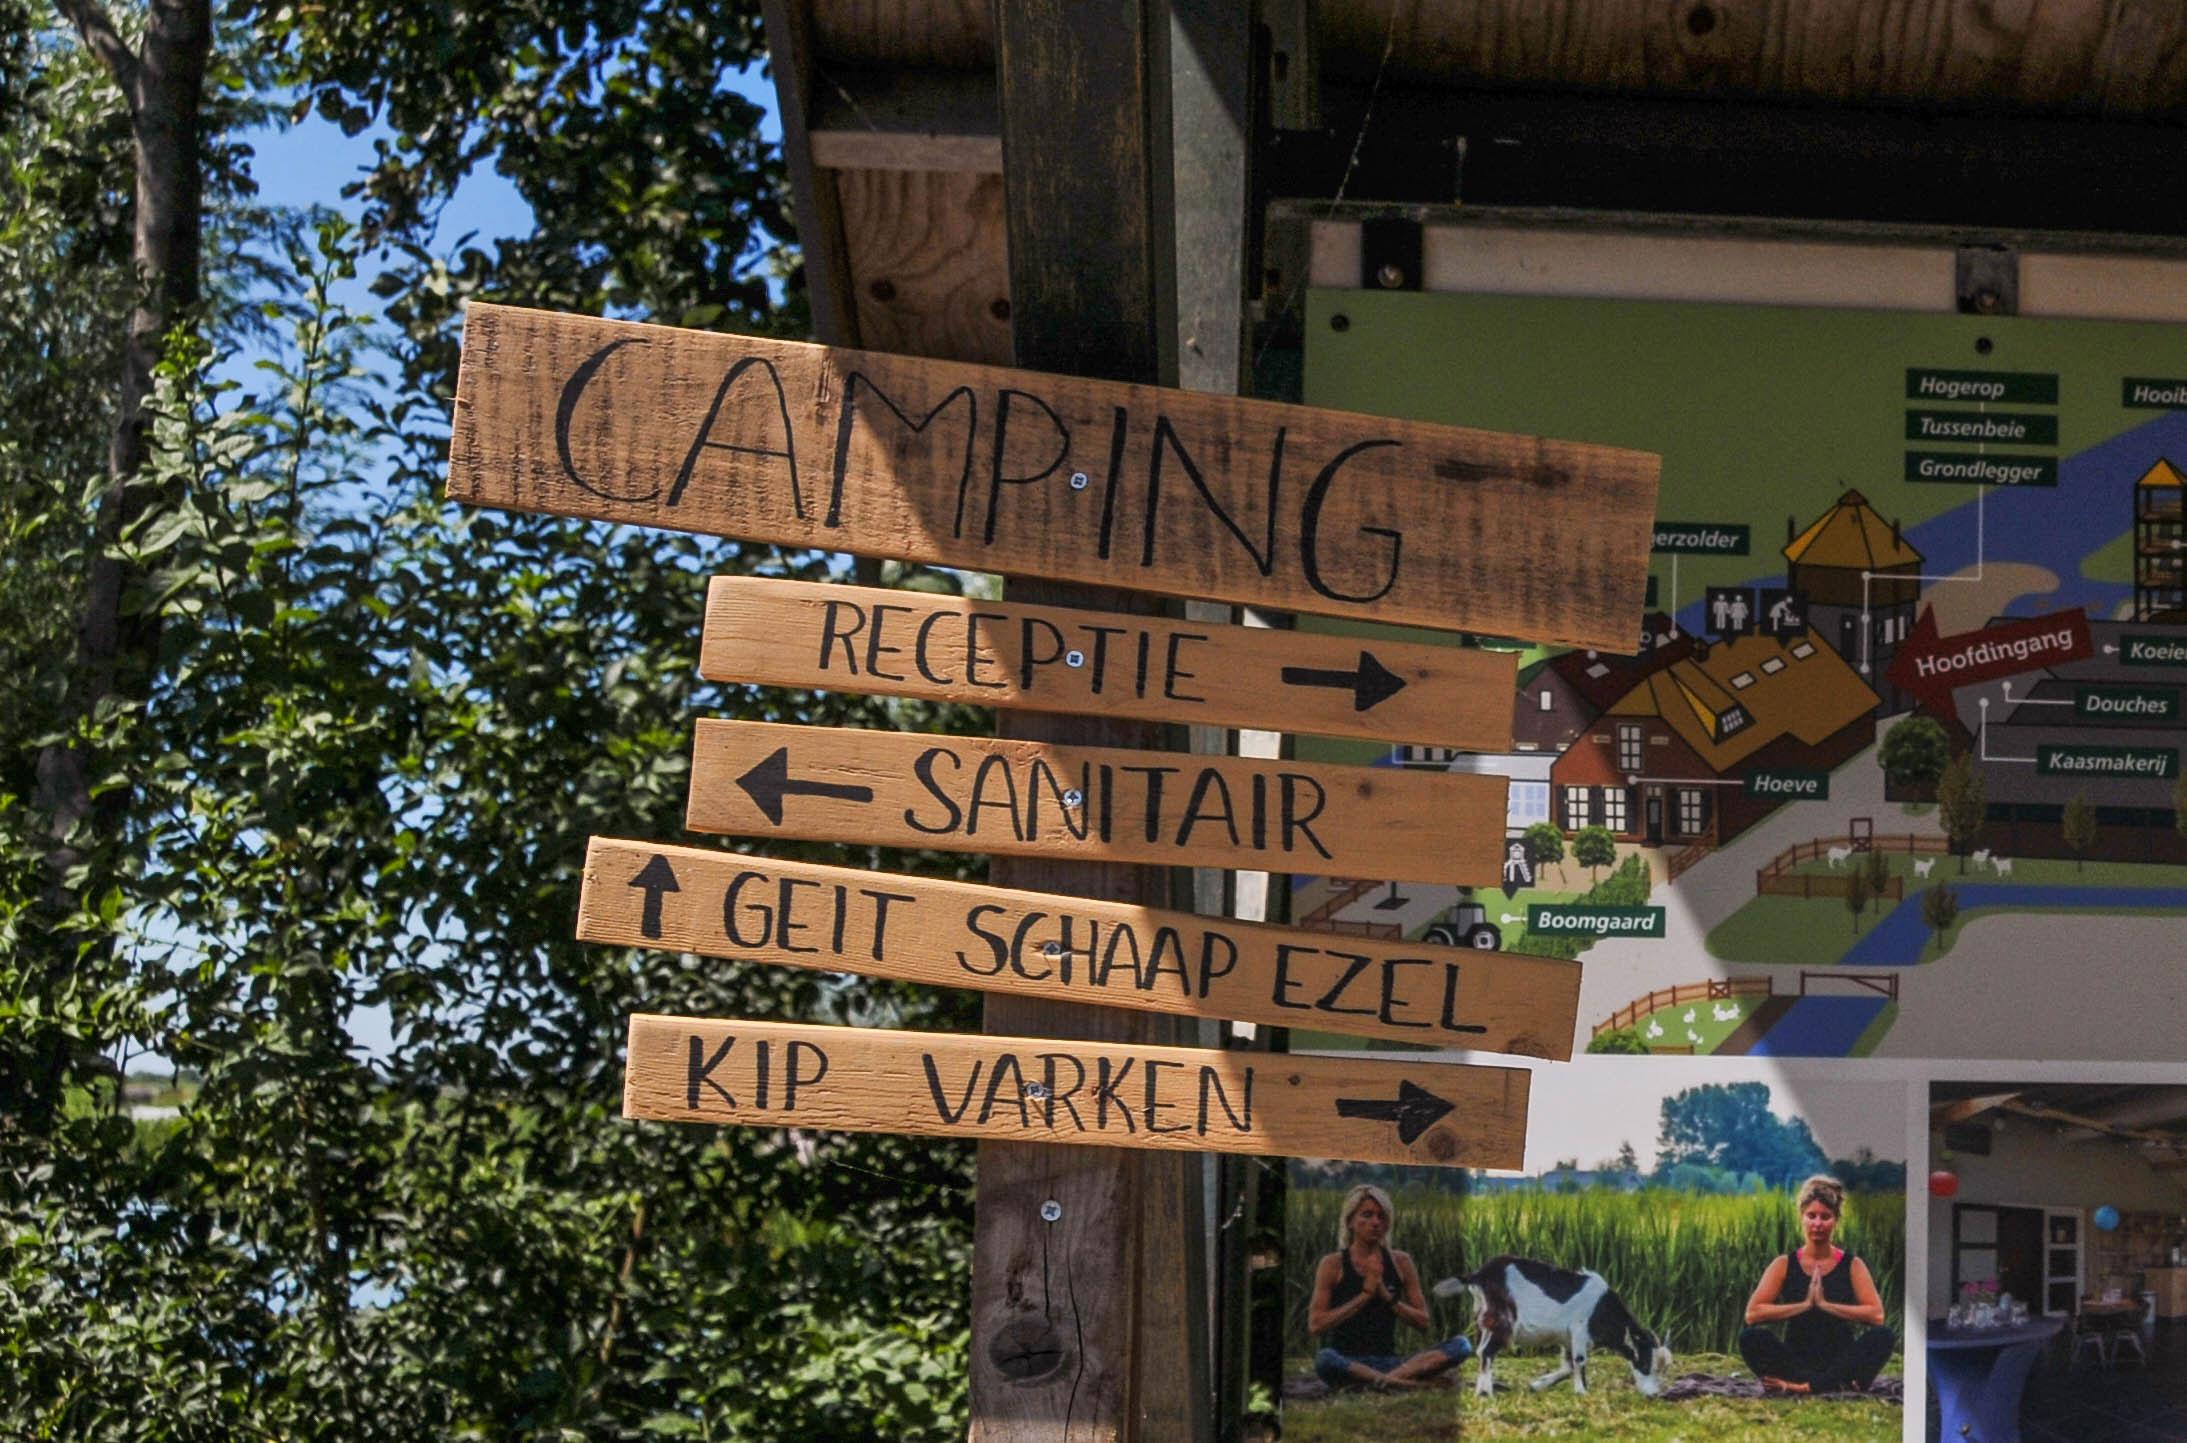 Campingbordje | Camping de Boerinn